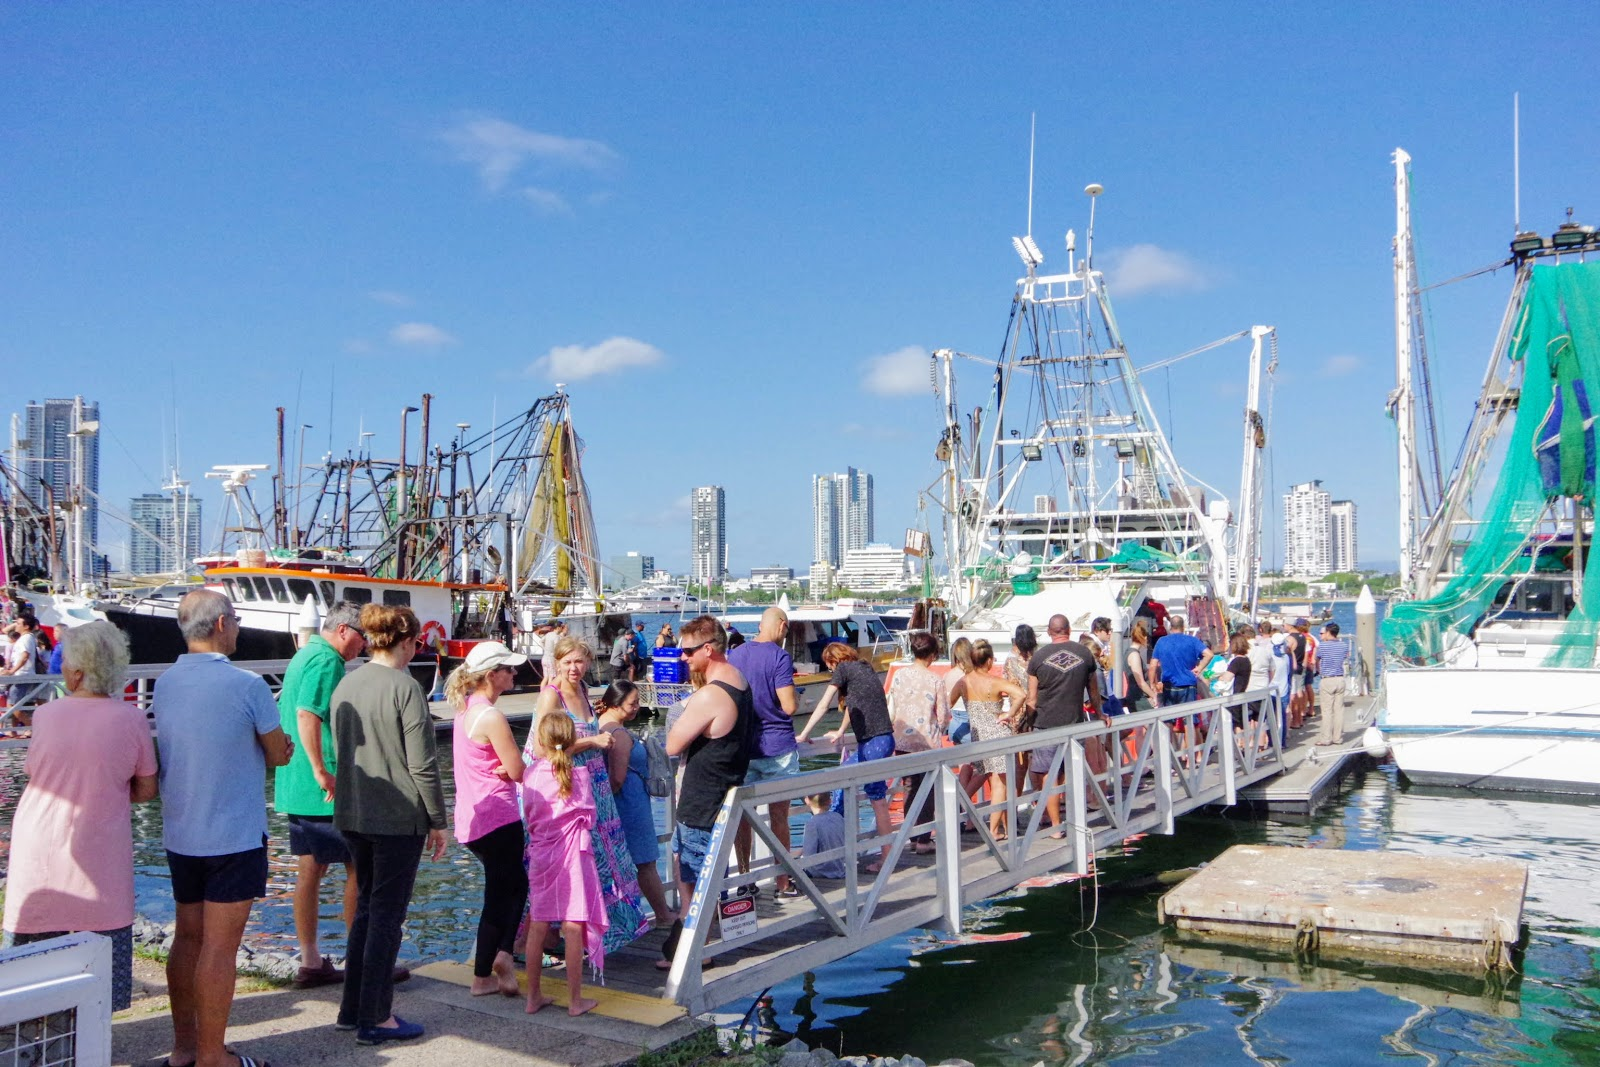 Gold Coast FishermenS Co-Operative Limited